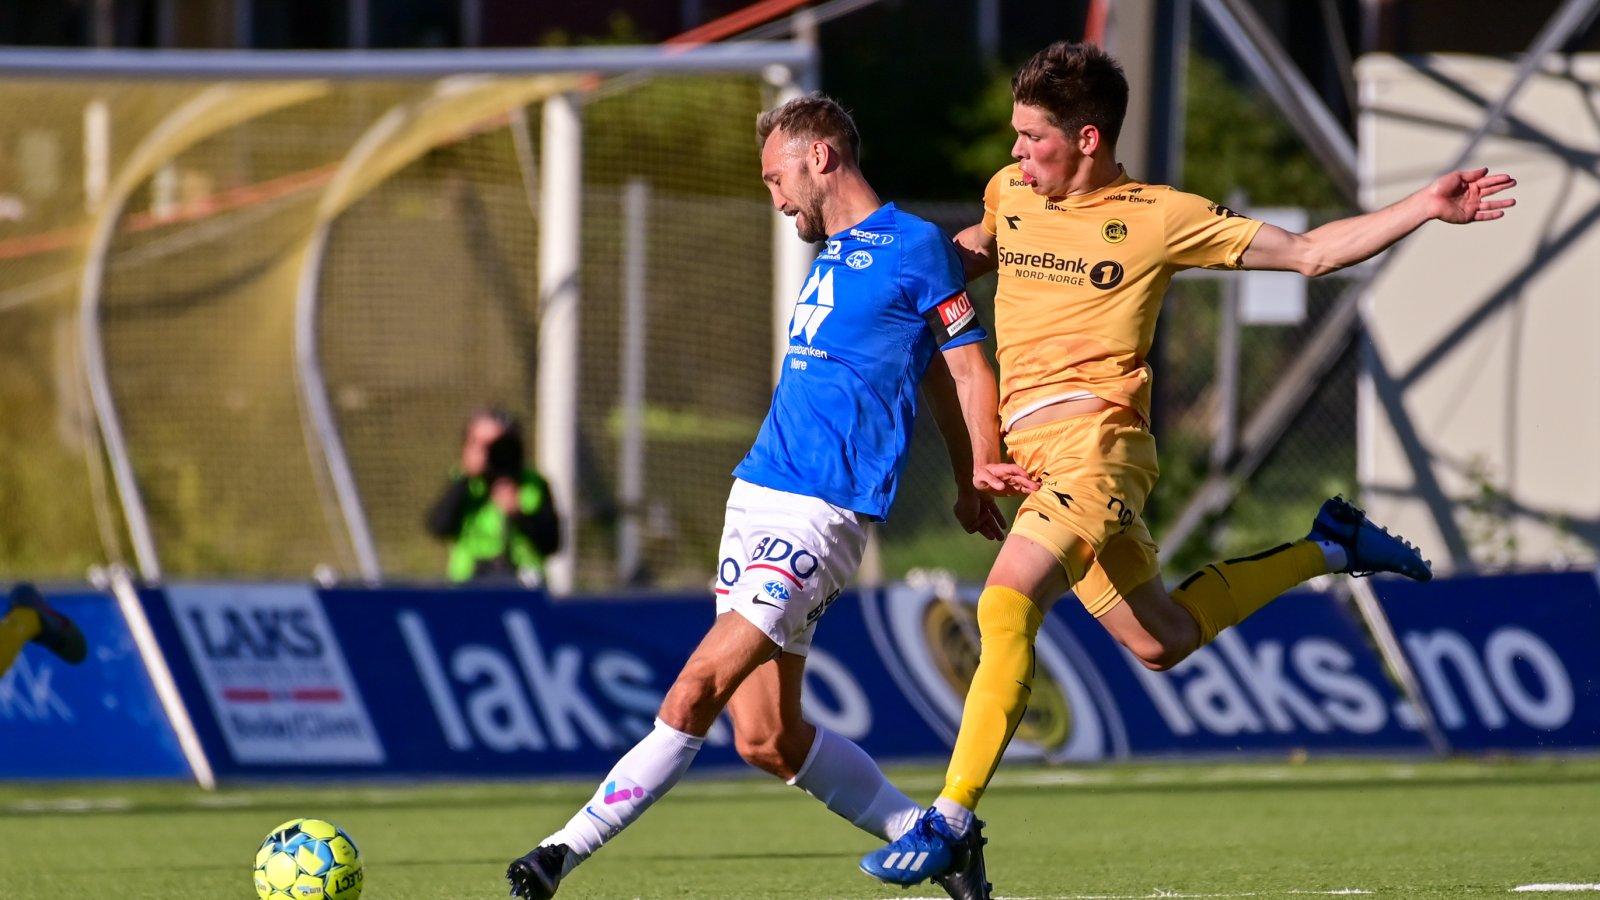 Sondre Brunstad Fet under hjemmekampen mot Molde i 2020.